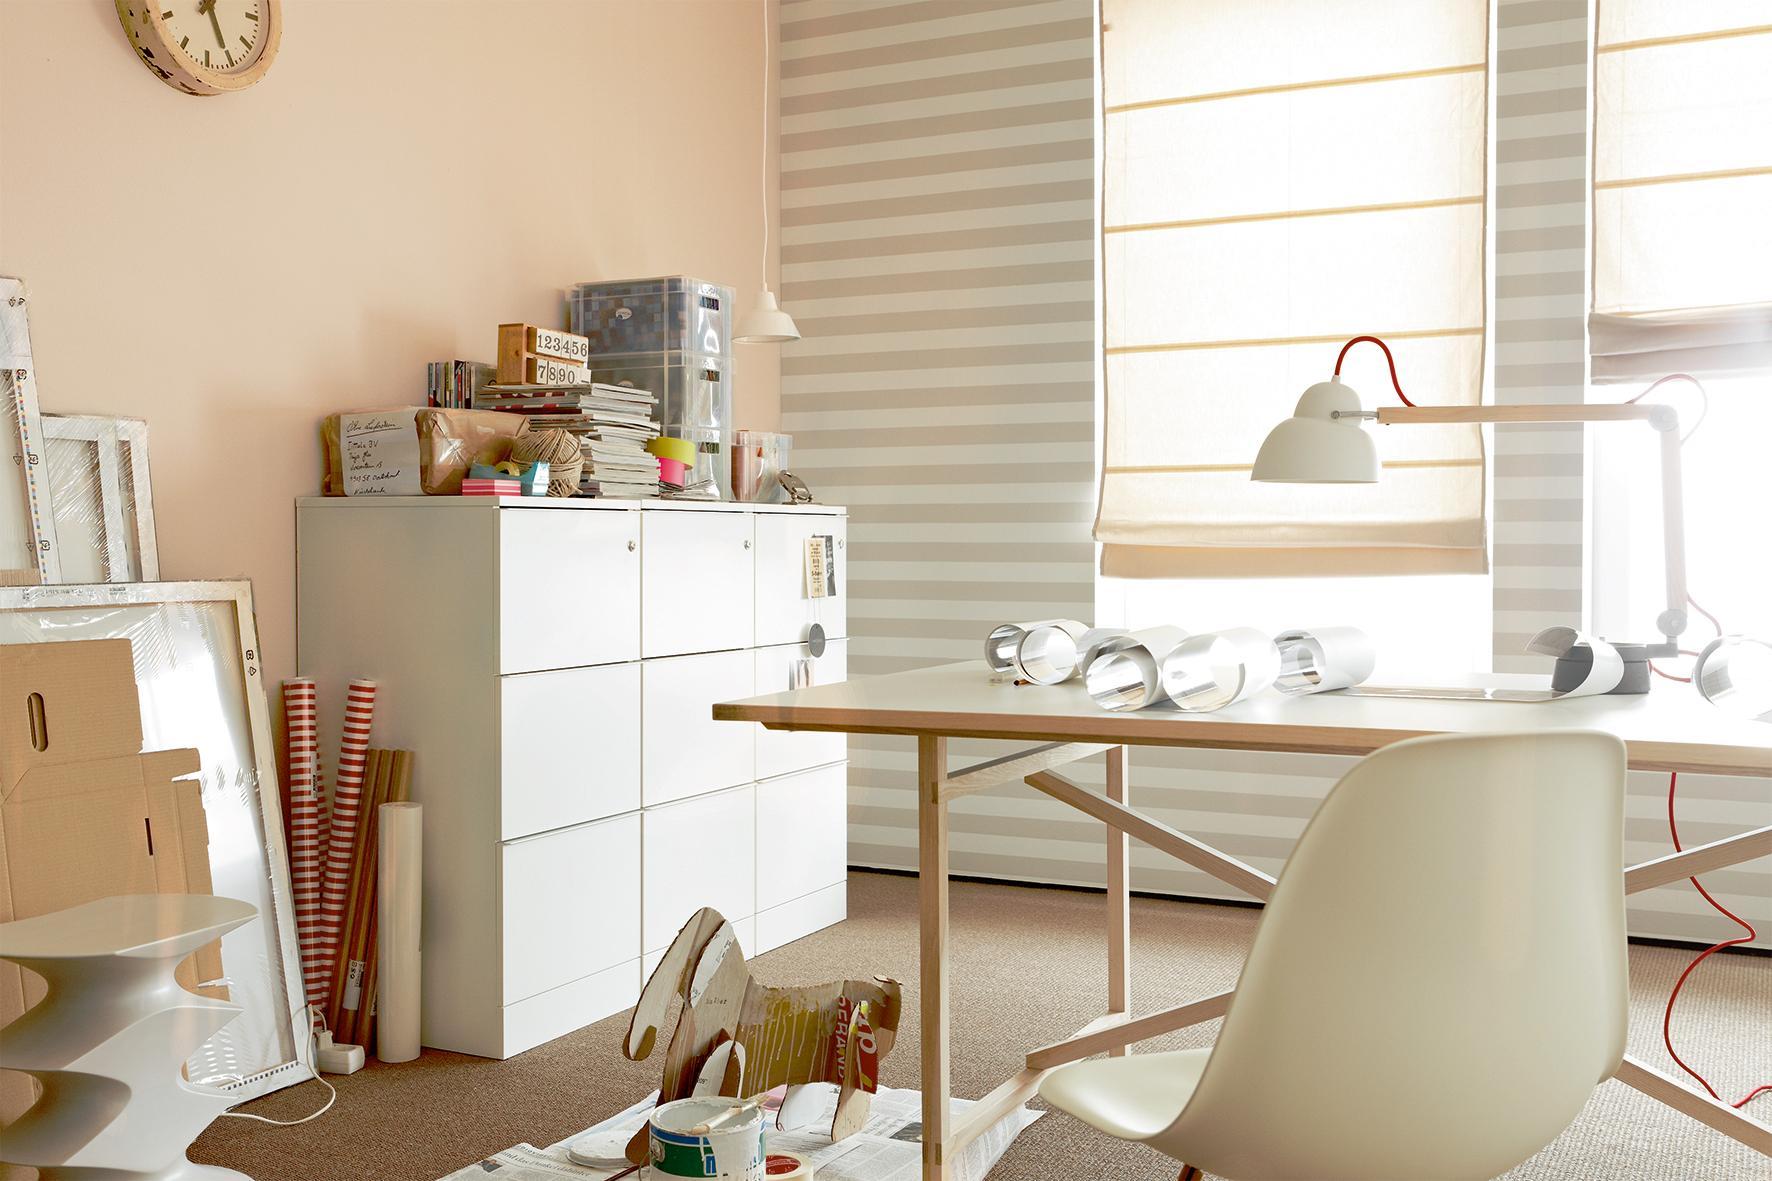 stehlampe bilder ideen couchstyle. Black Bedroom Furniture Sets. Home Design Ideas